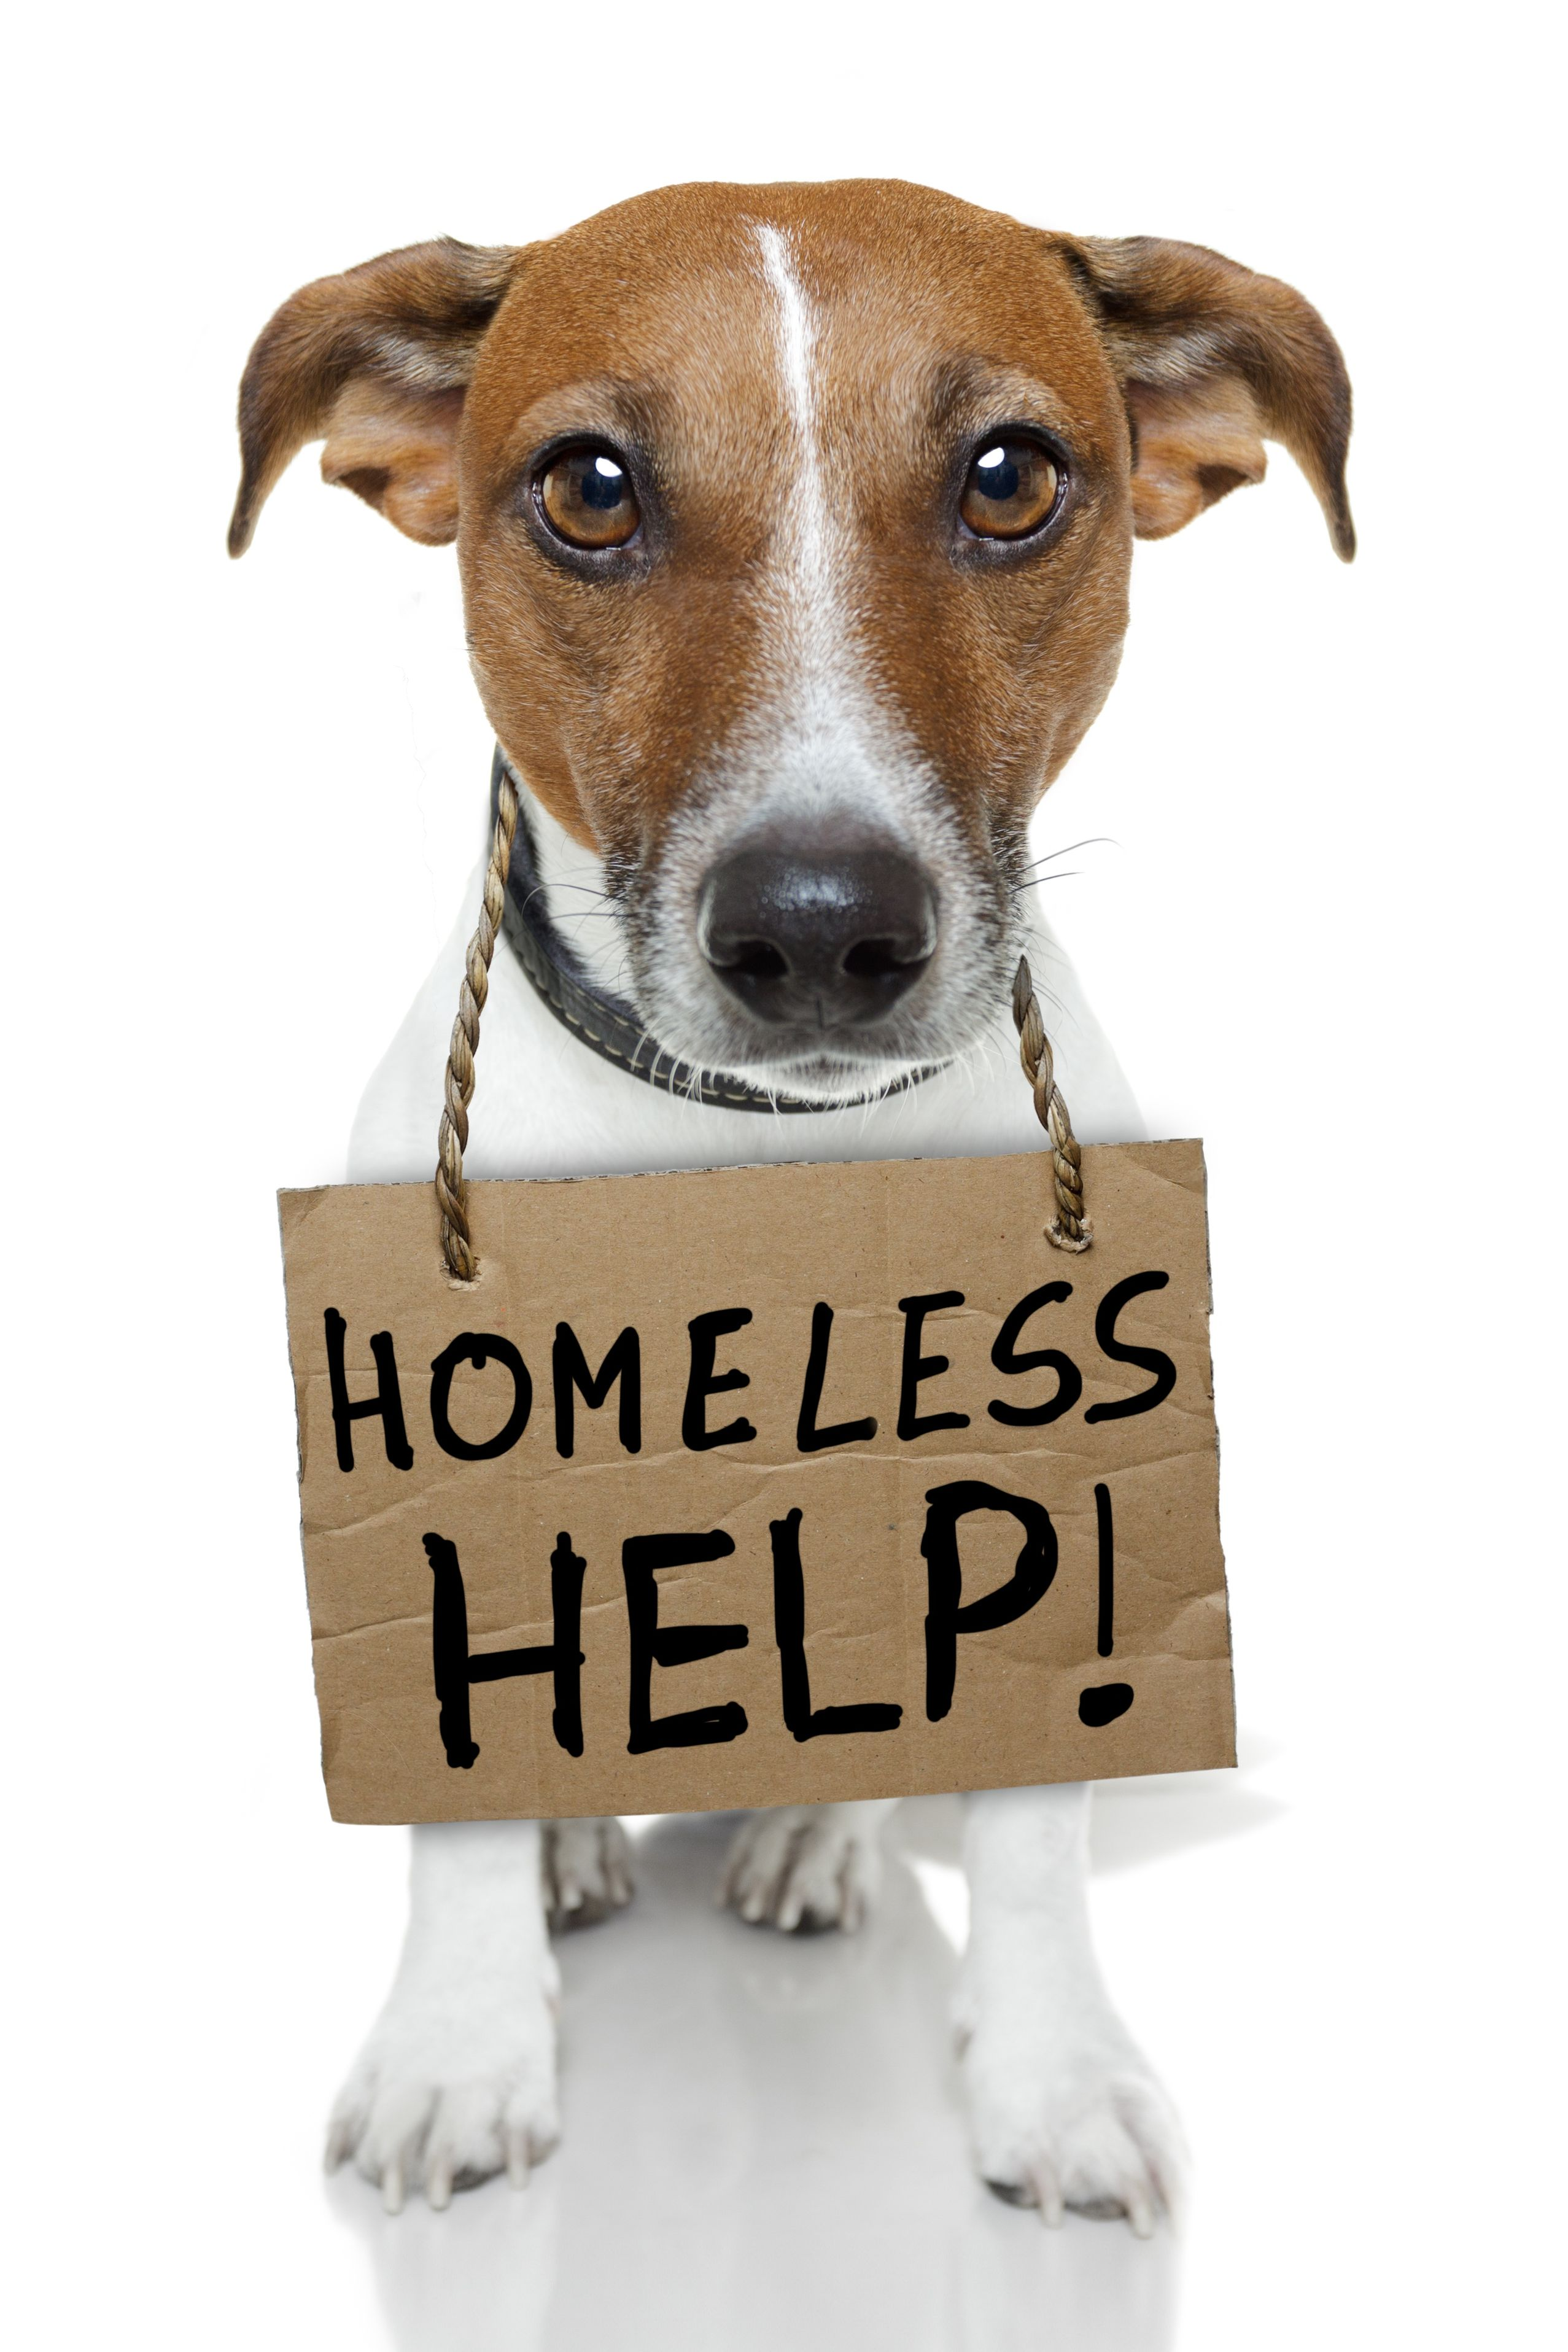 Help Homeless Pets